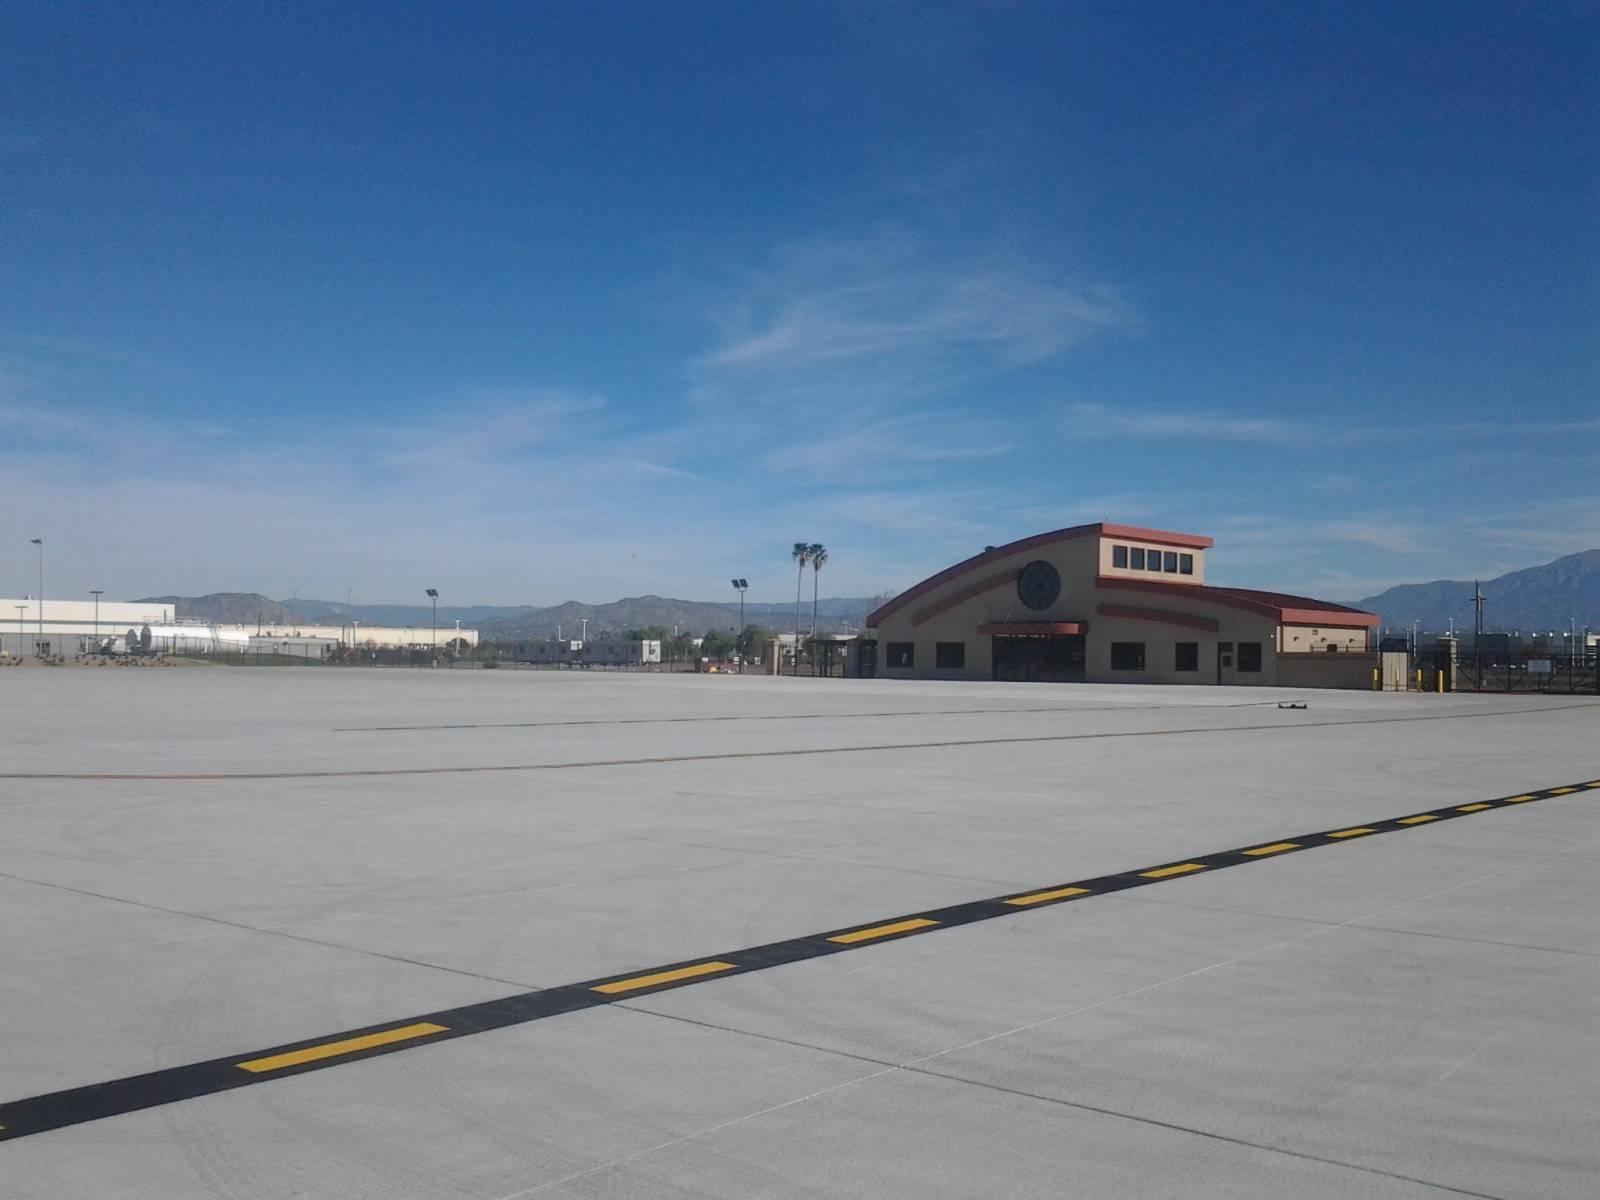 Apron View of Terminal